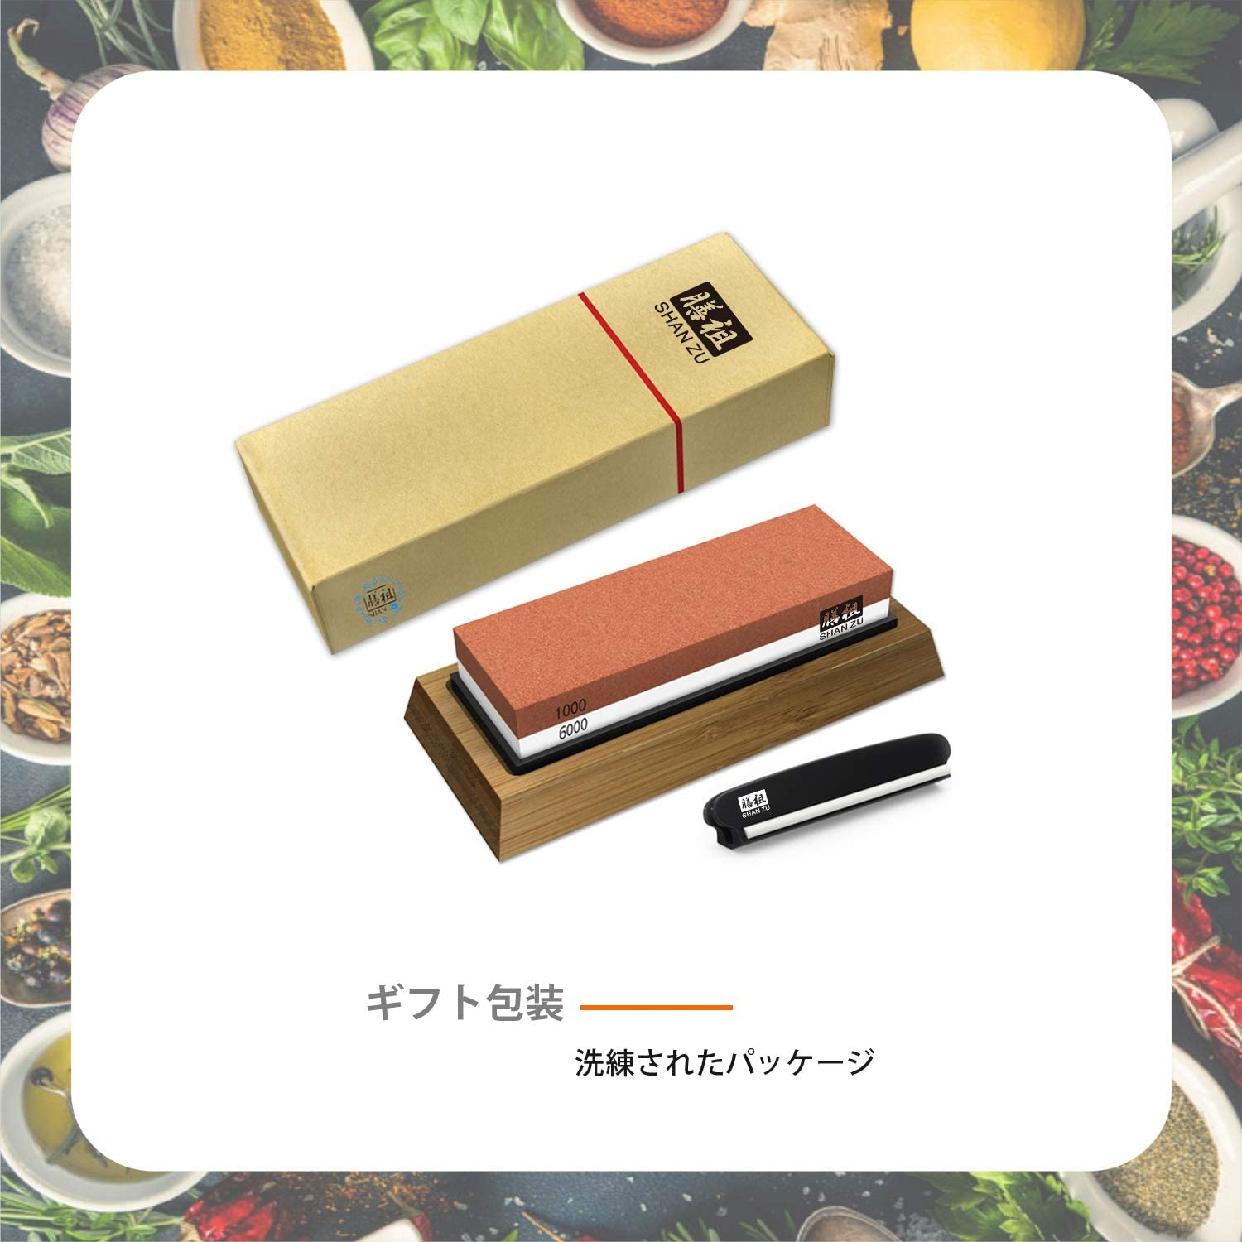 SHAN ZU 両面砥石 #1000/#6000 21.5 x 9.5 x 5.5 cmの商品画像7